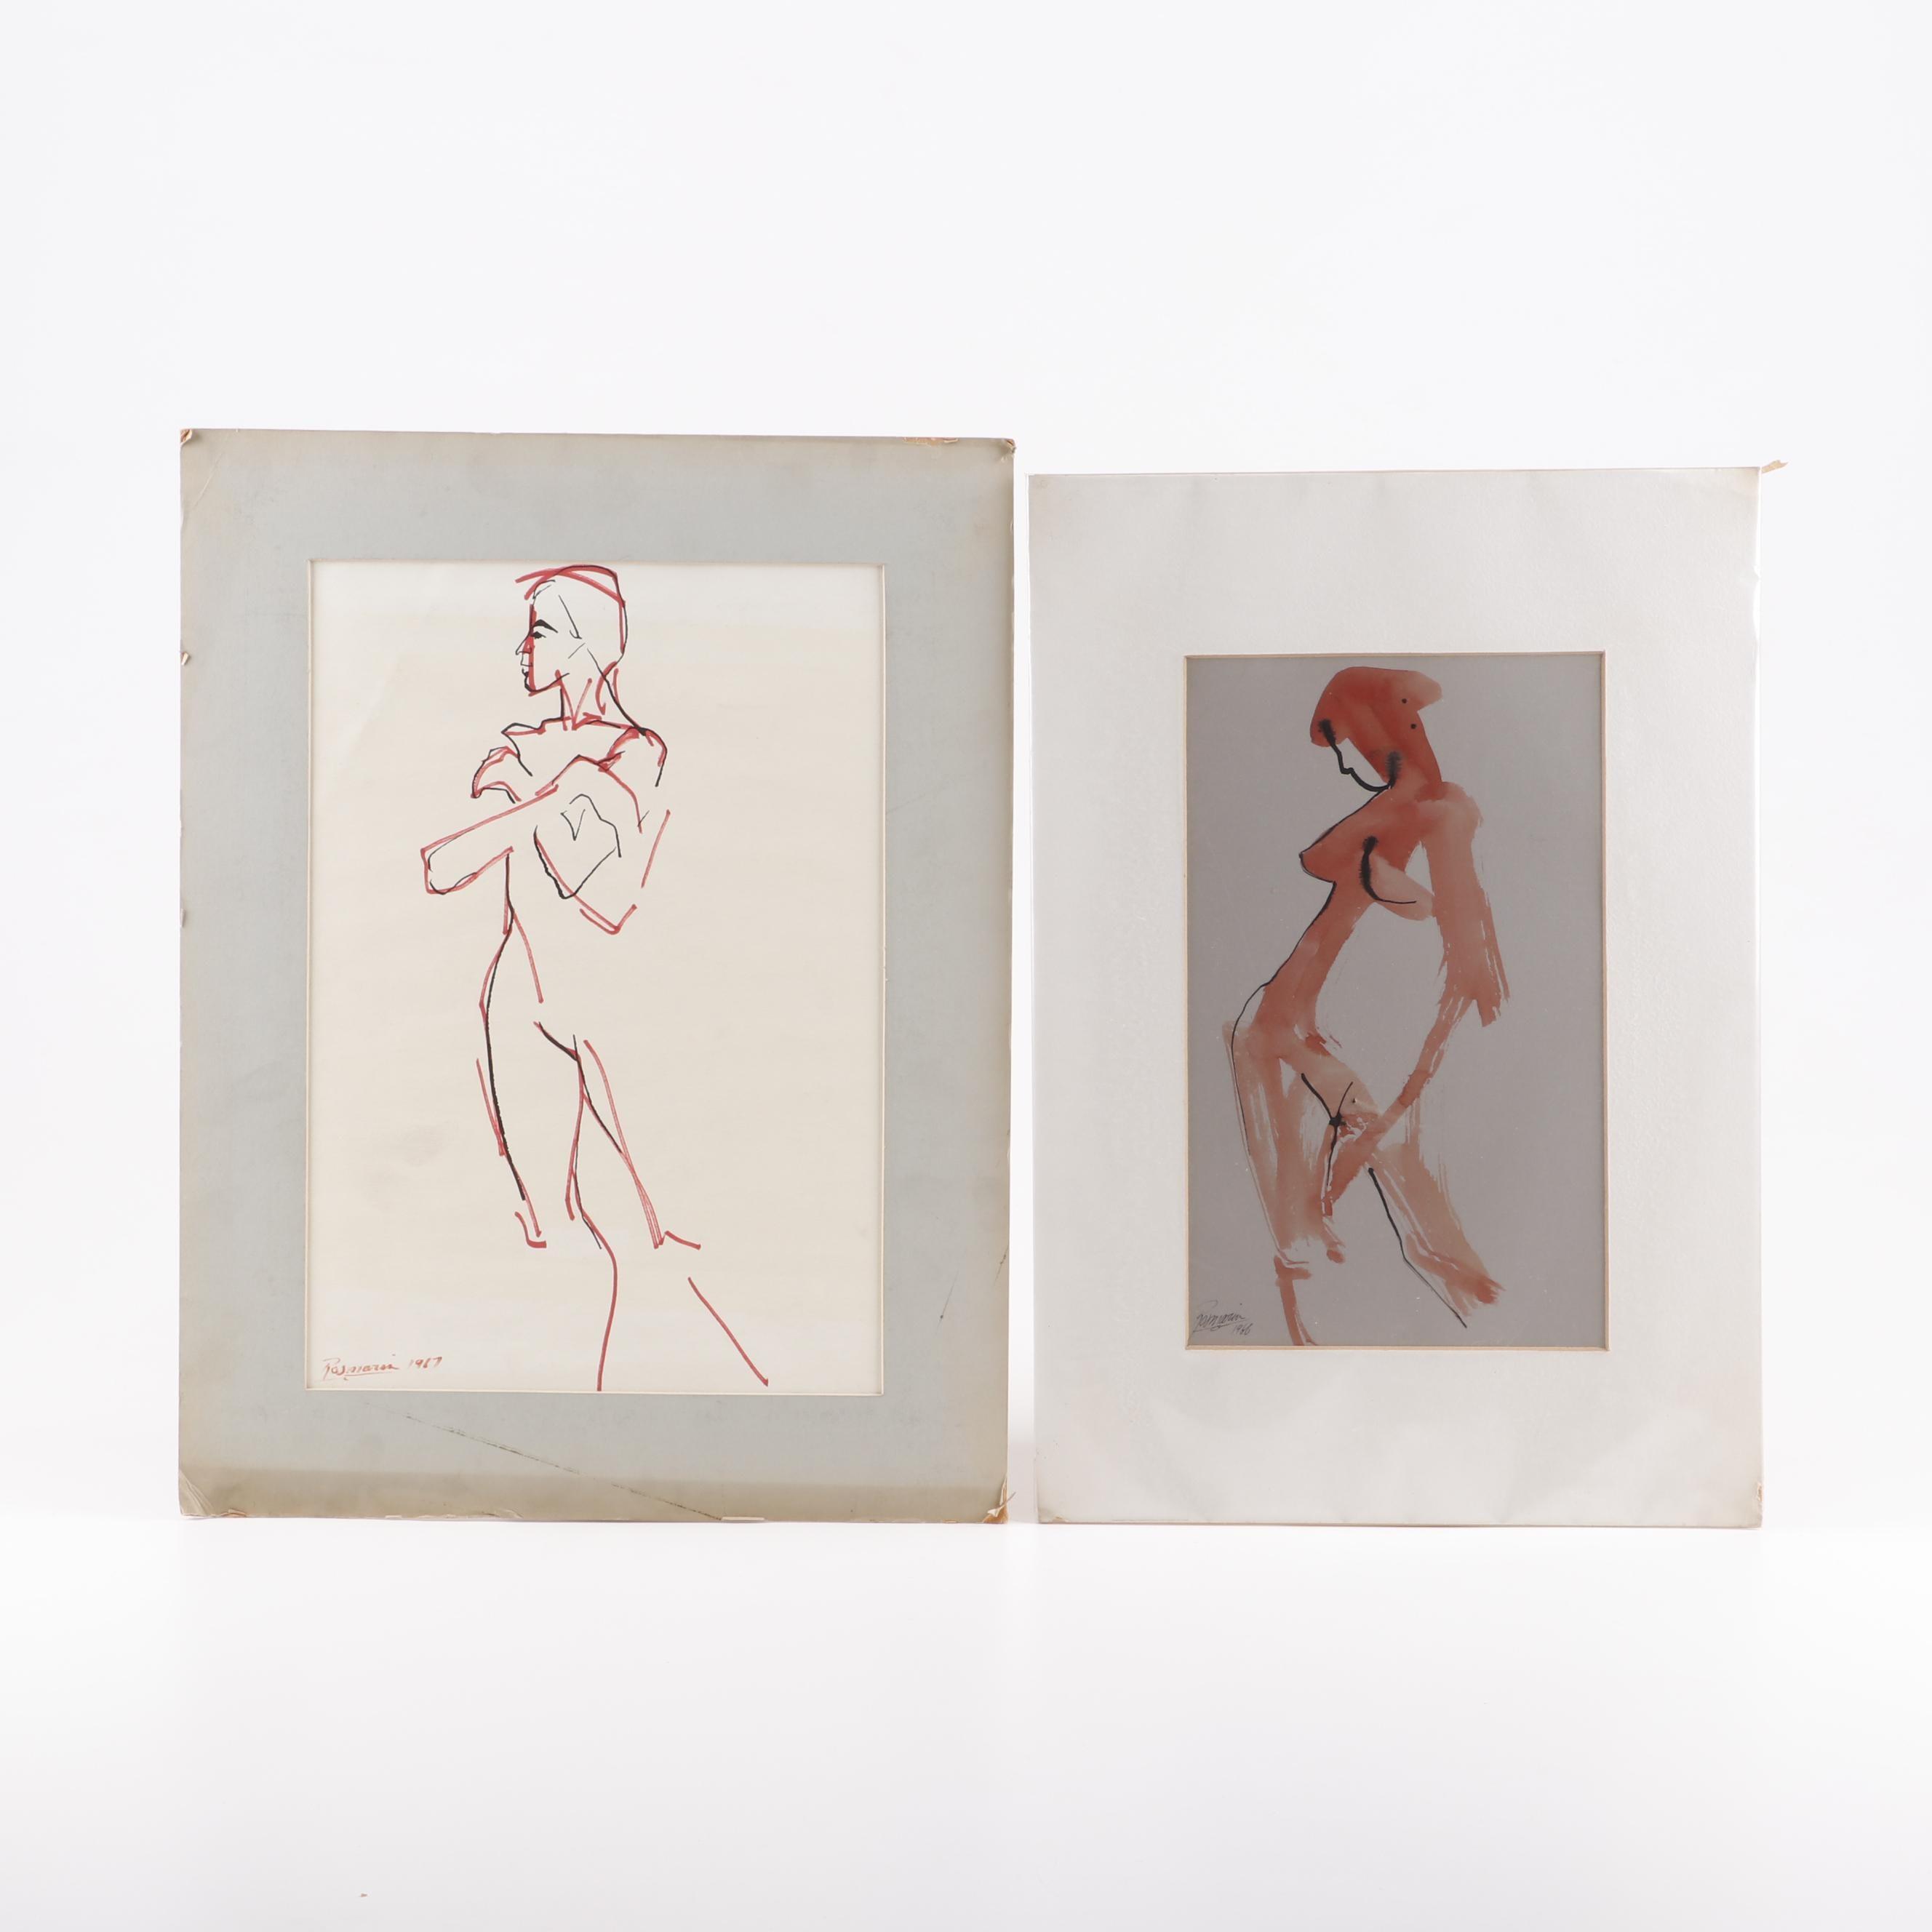 Richard Rosmarin Nude Drawings, Late 20th Century